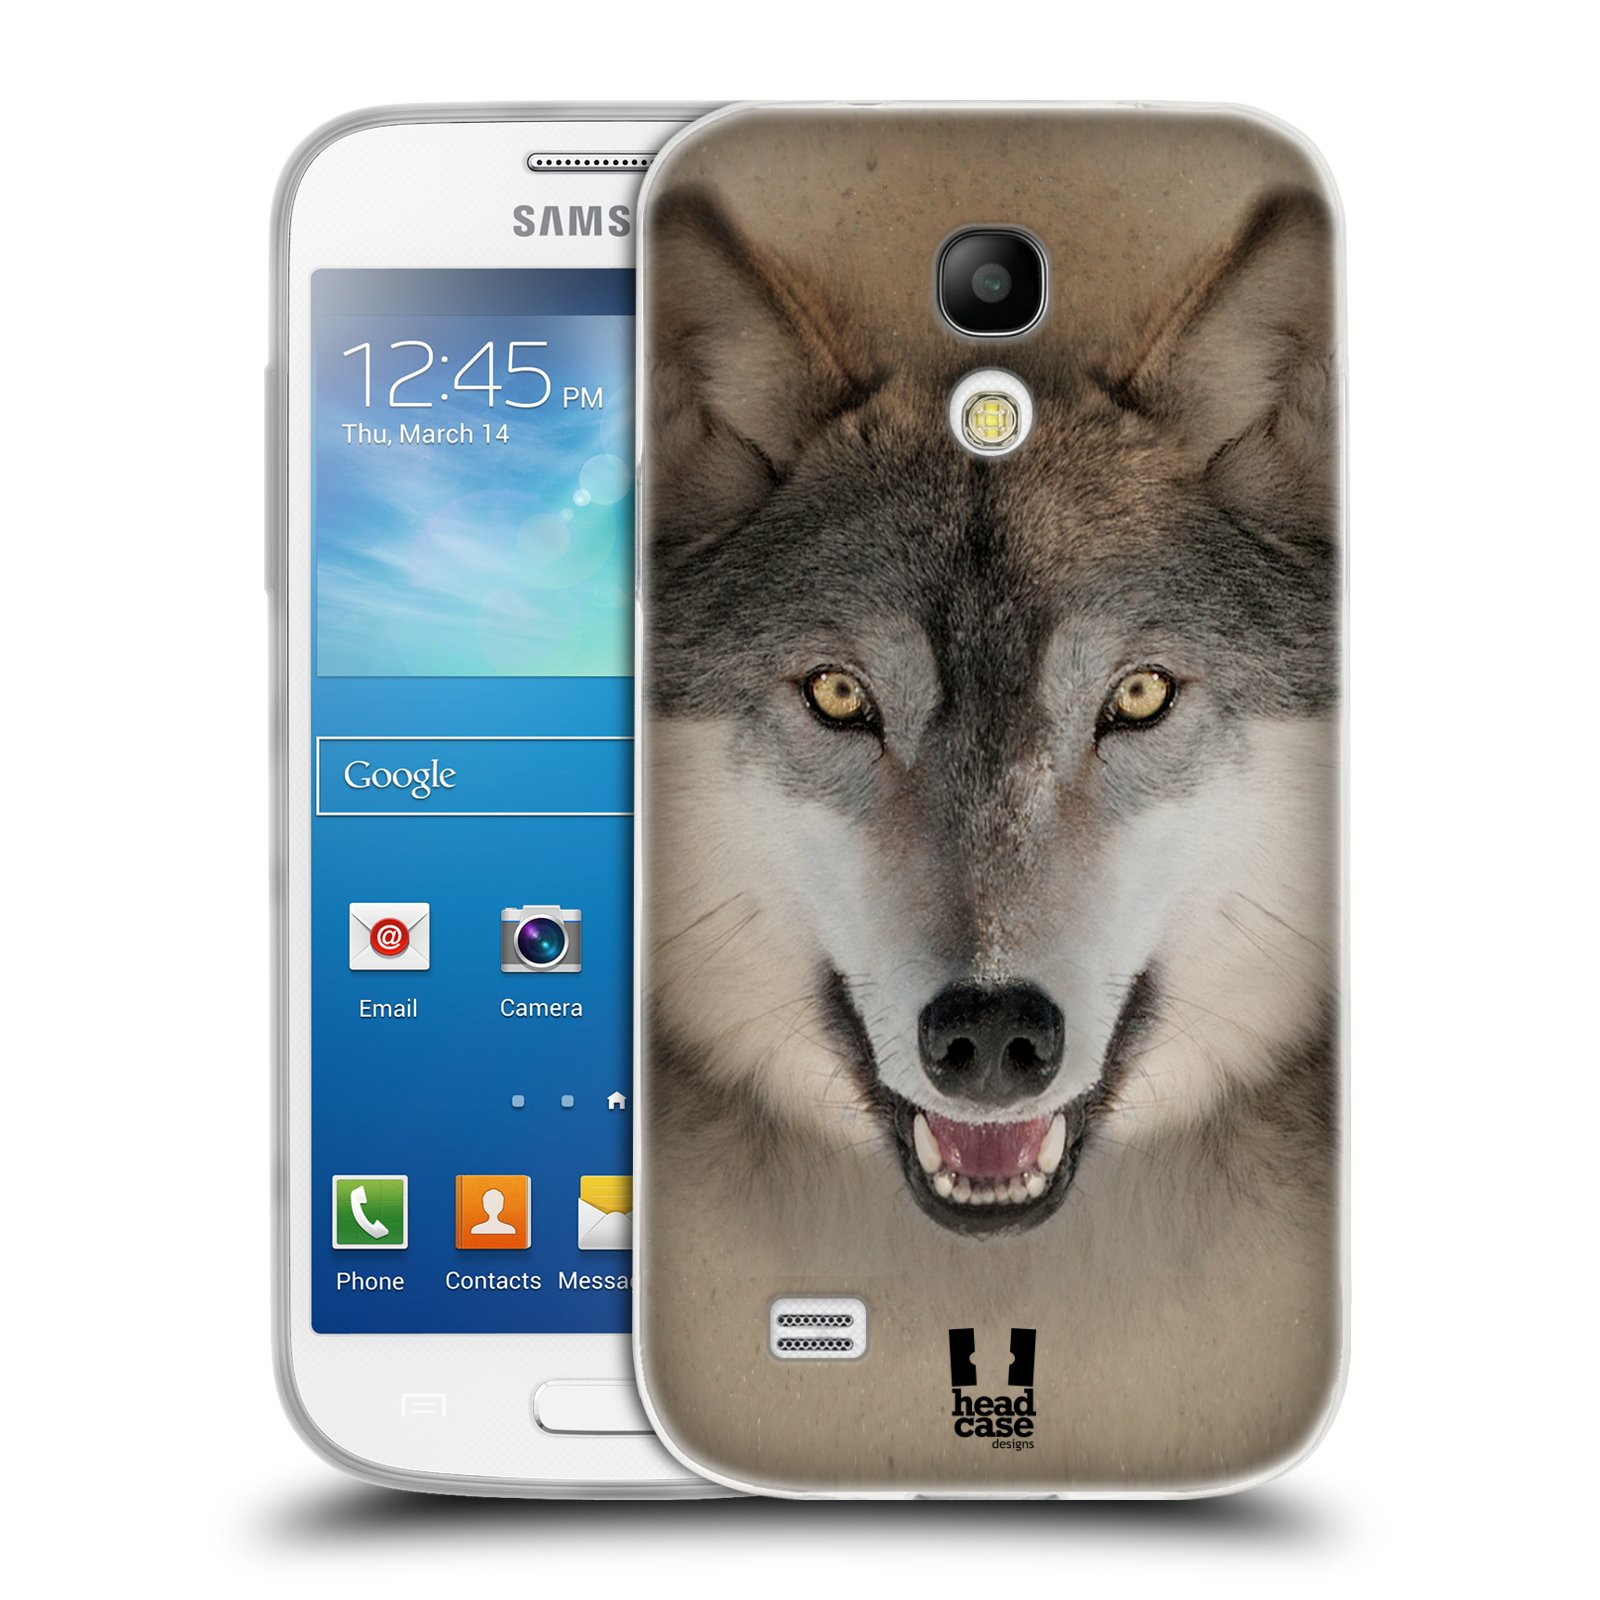 HEAD CASE silikonový obal na mobil Samsung Galaxy S4 MINI vzor Zvířecí tváře 2 vlk šedý